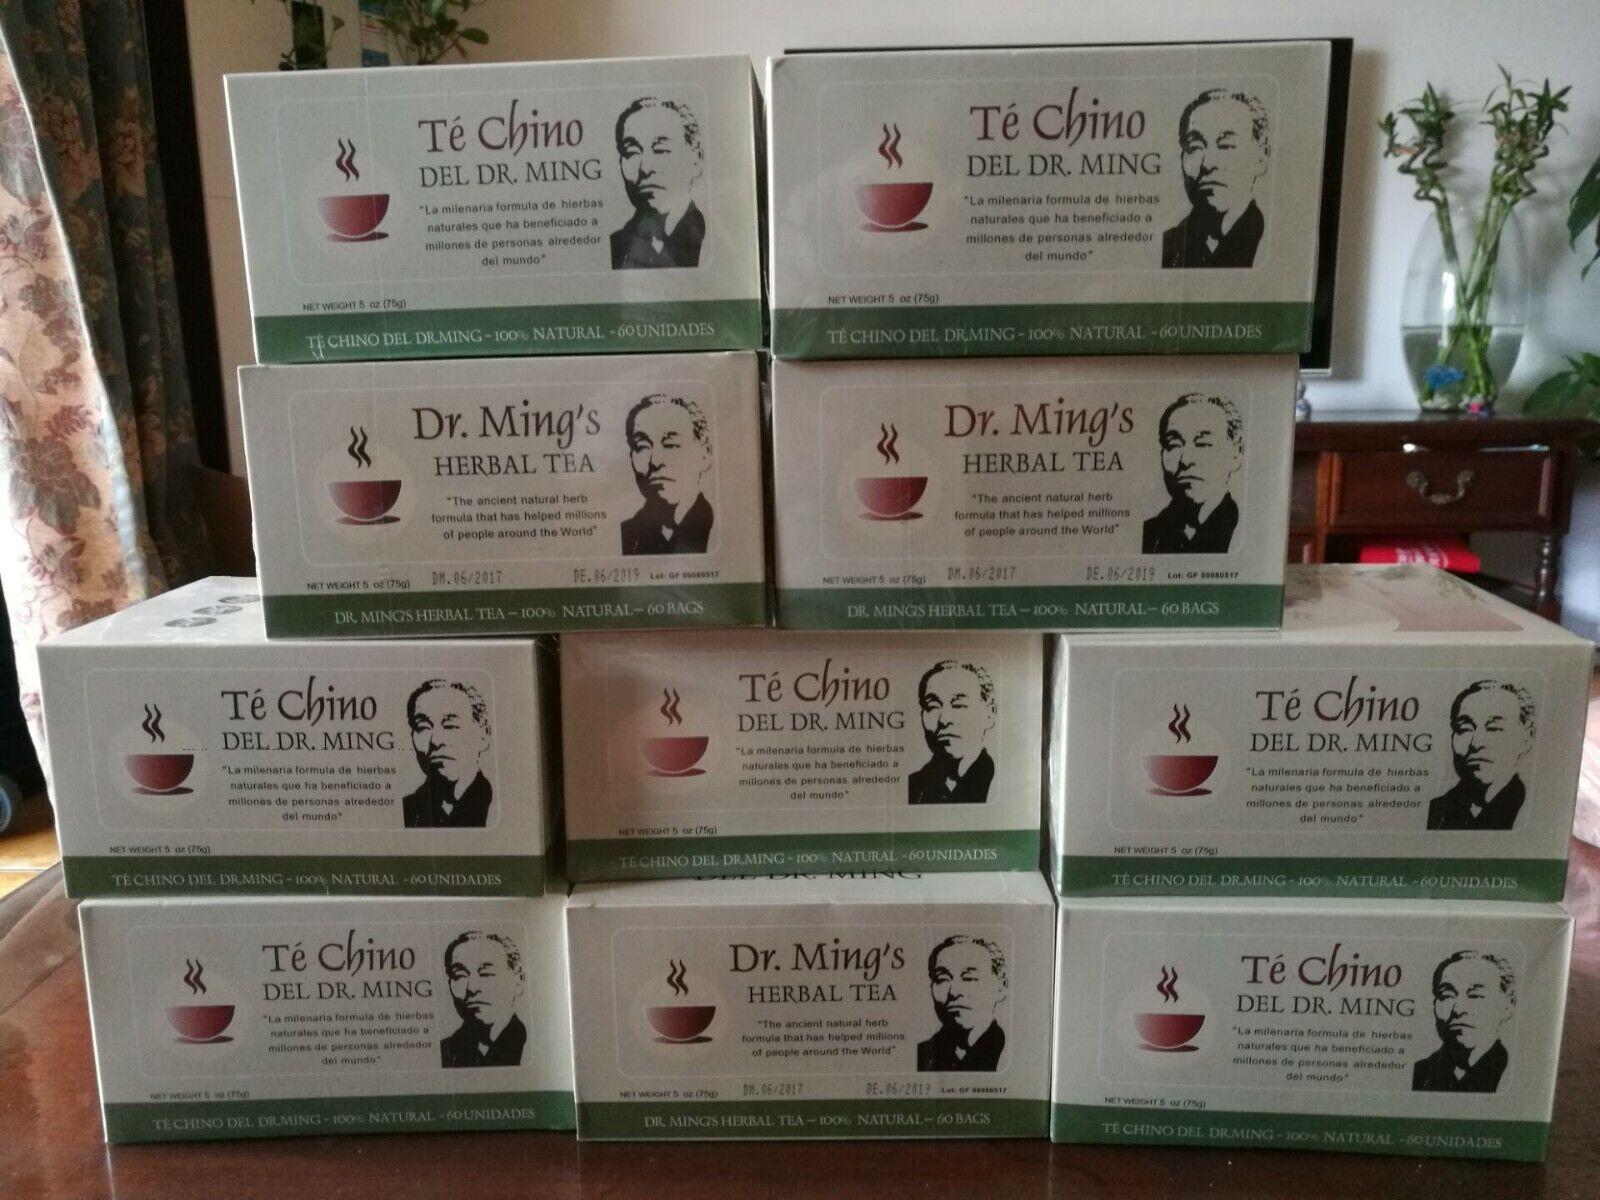 Dr. Ming Herbal Tea Weight Loss Antioxidant Natural Detox Slimming Tea  60bags